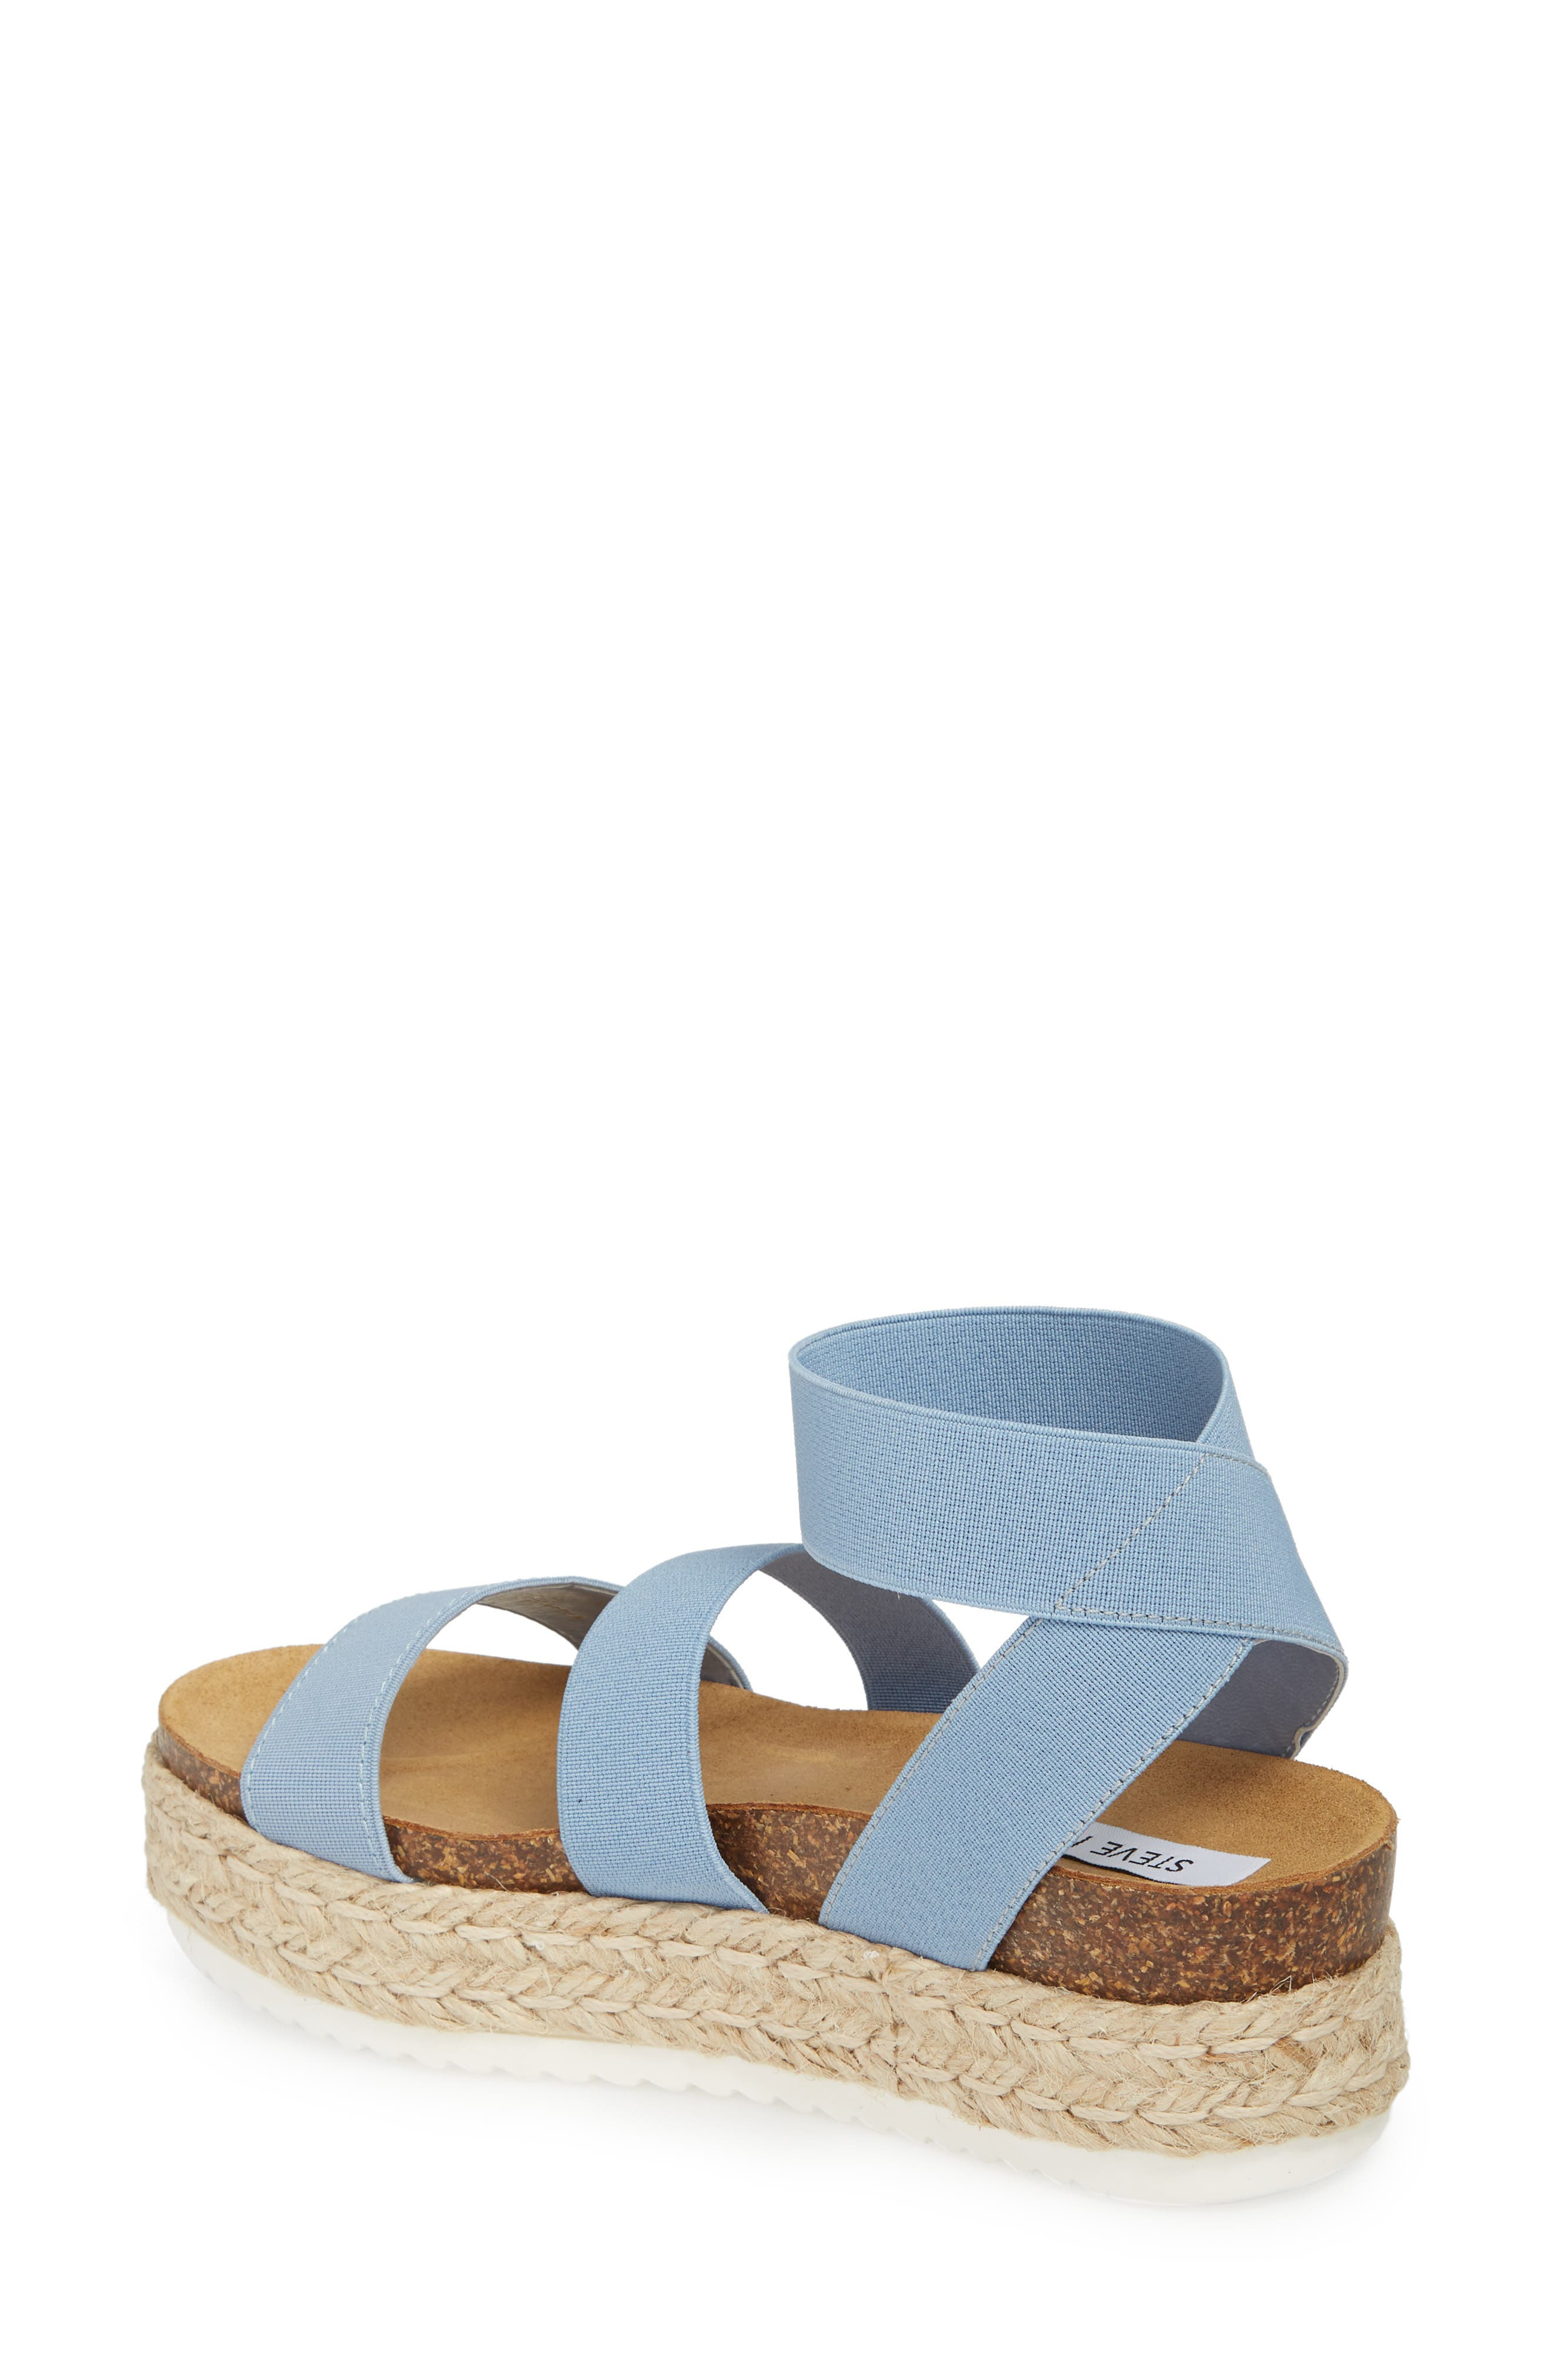 Kimmie Flatform Sandal,                             Alternate thumbnail 5, color,